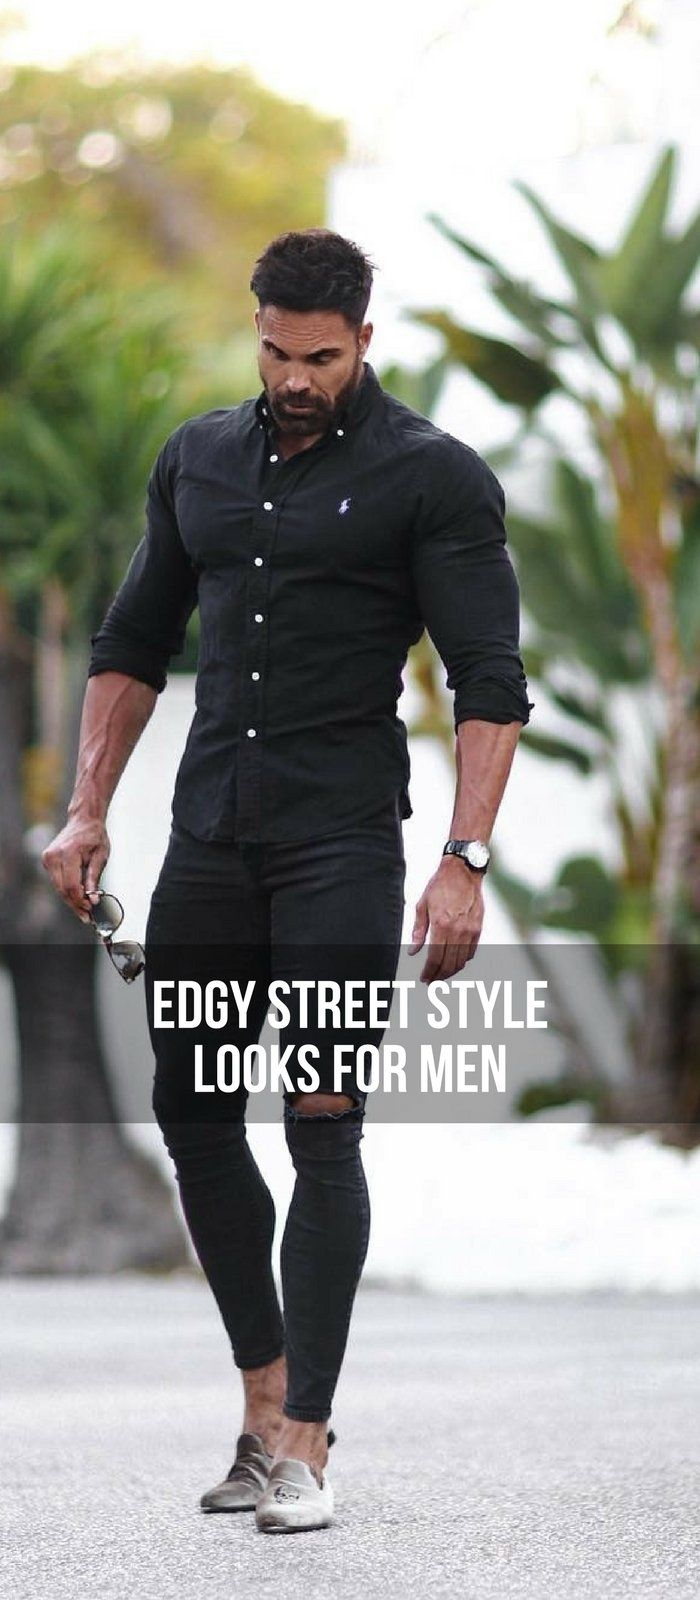 edgy street style looks to help you dress sharp menus fashion